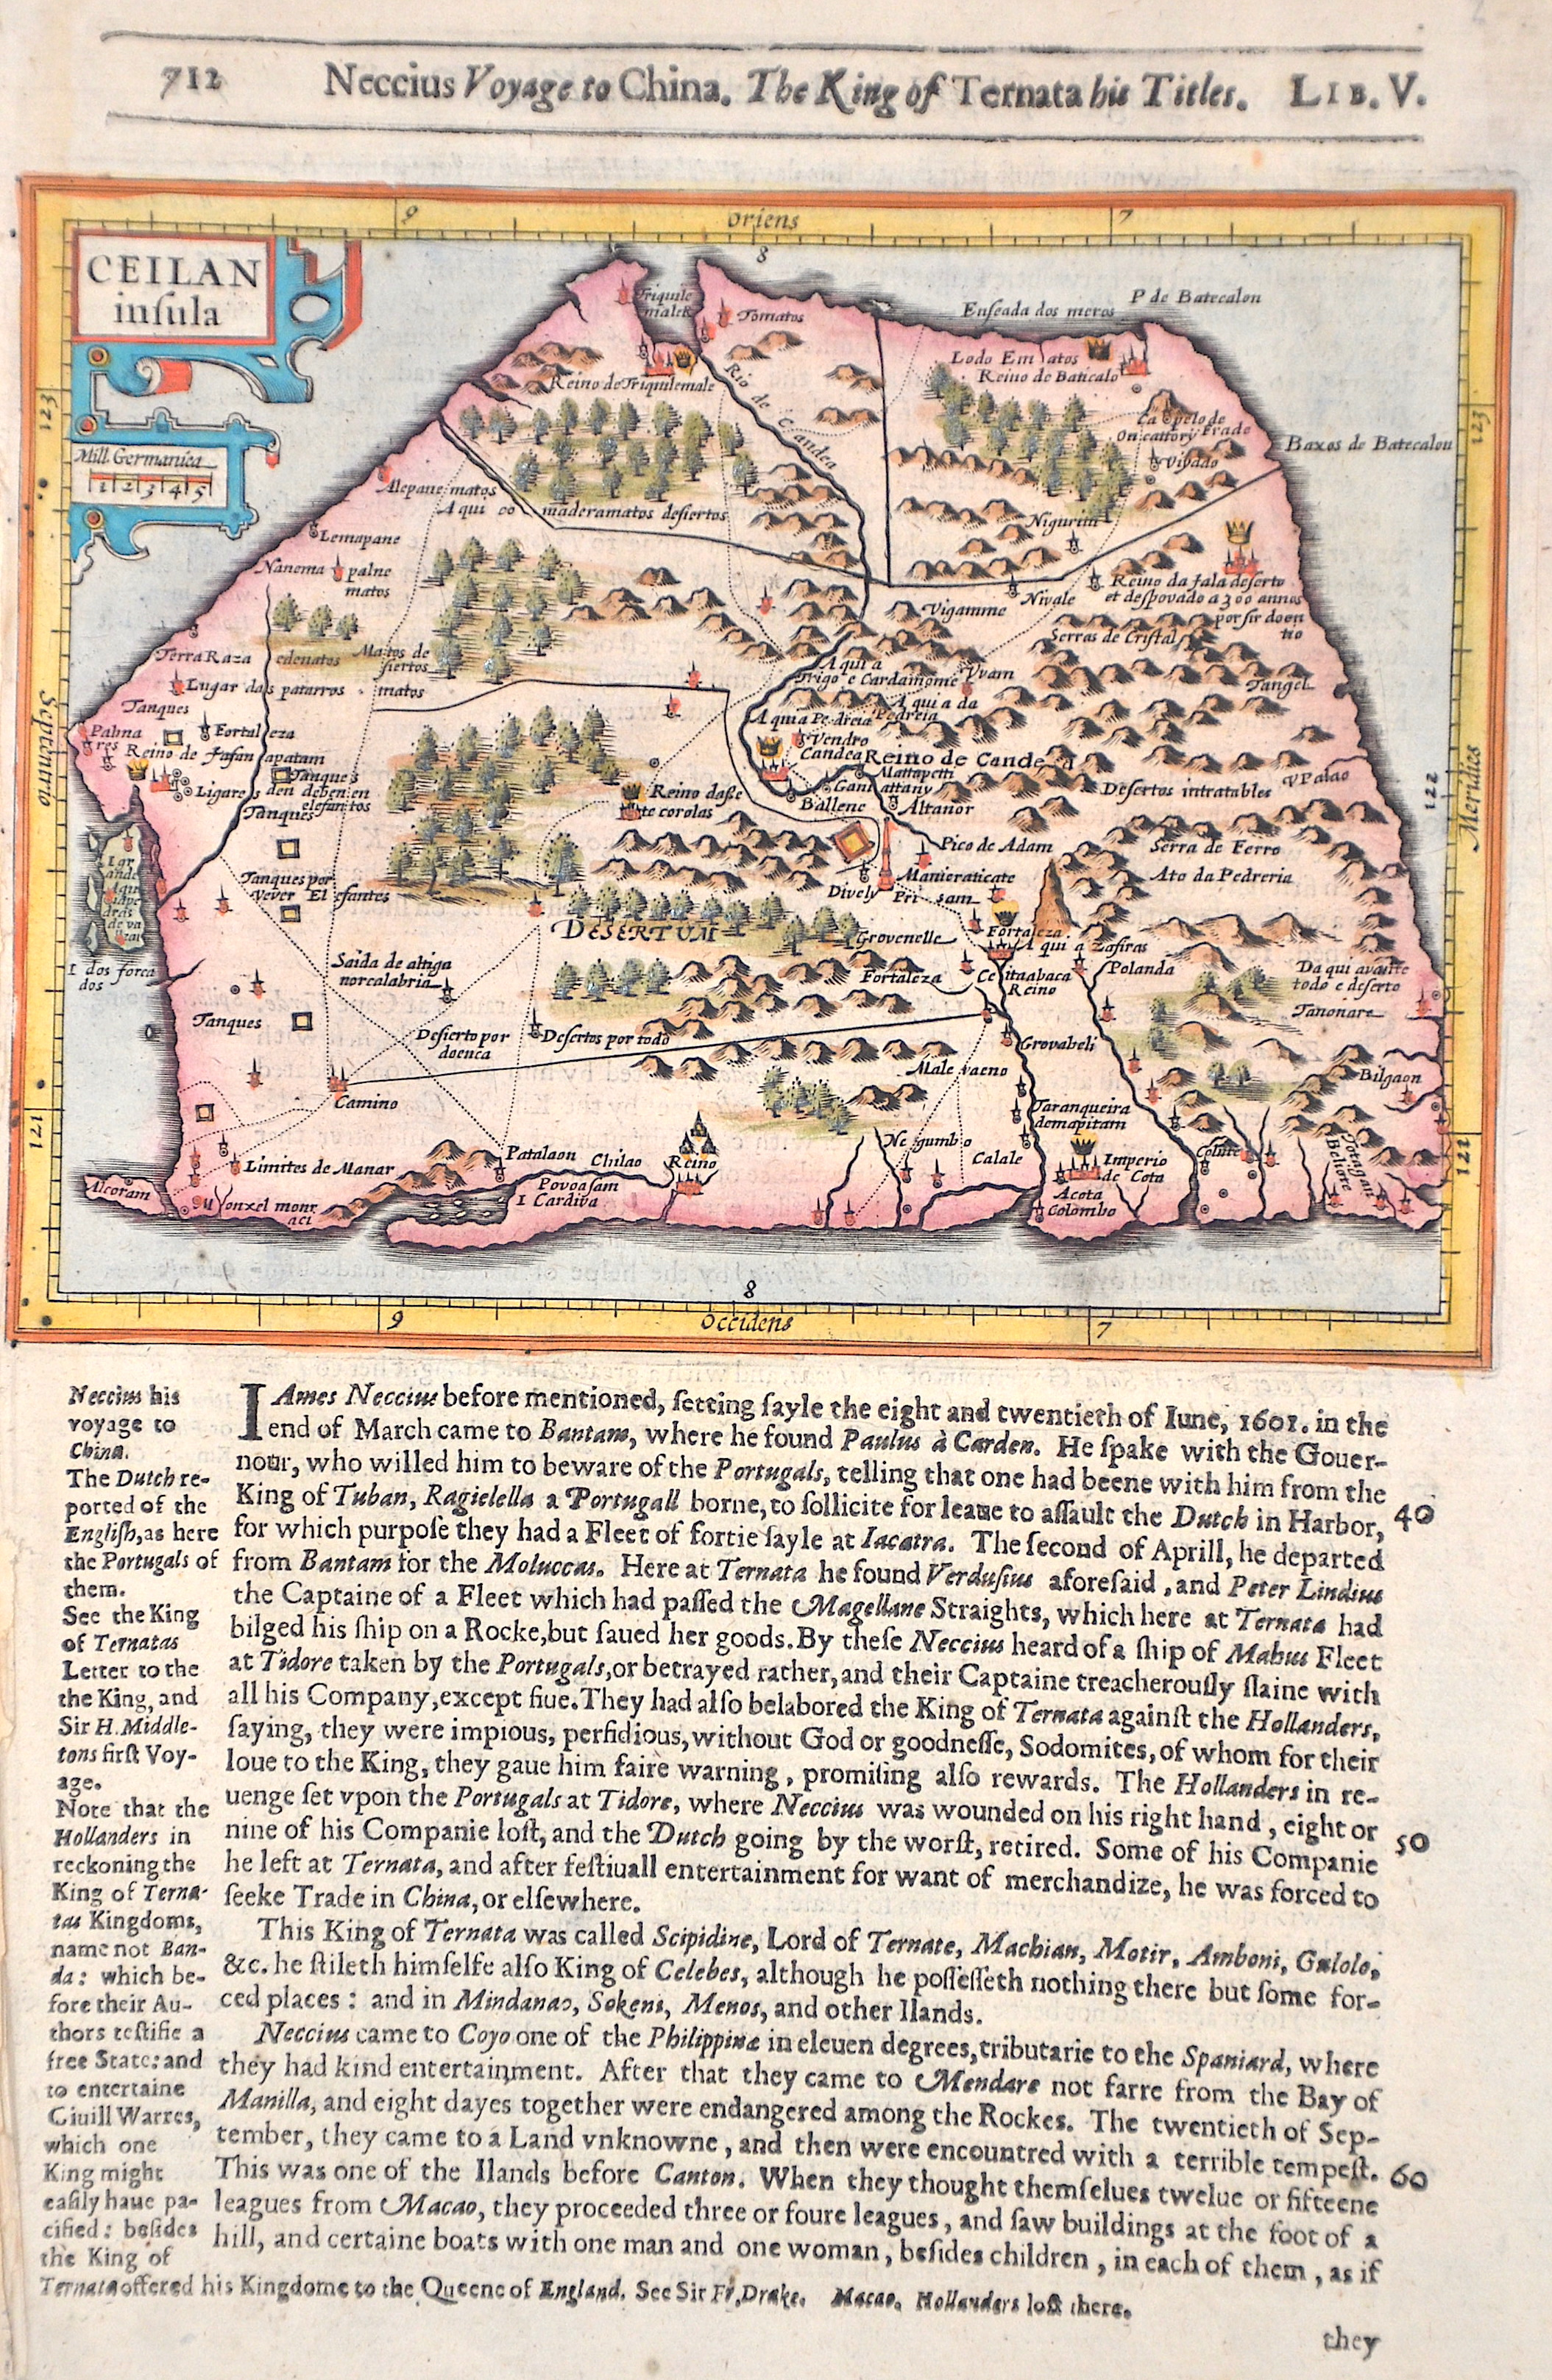 Hondius/Sparke  Ceilan insula / Neccius Voyage to China.